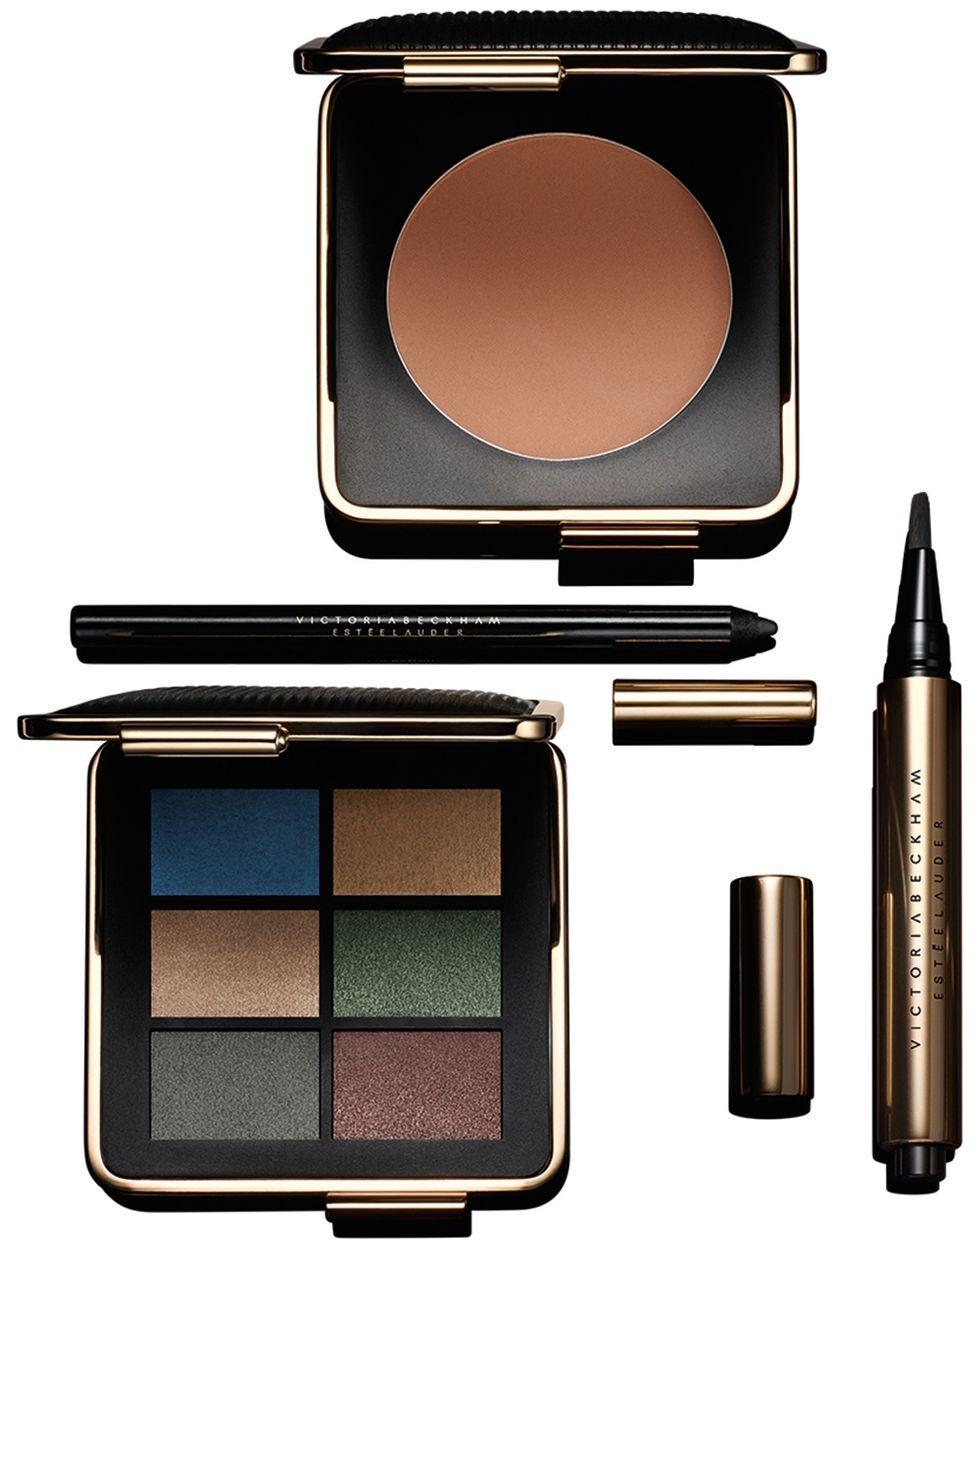 Victoria Beckham Estee Lauder Makeup Collection Victoria